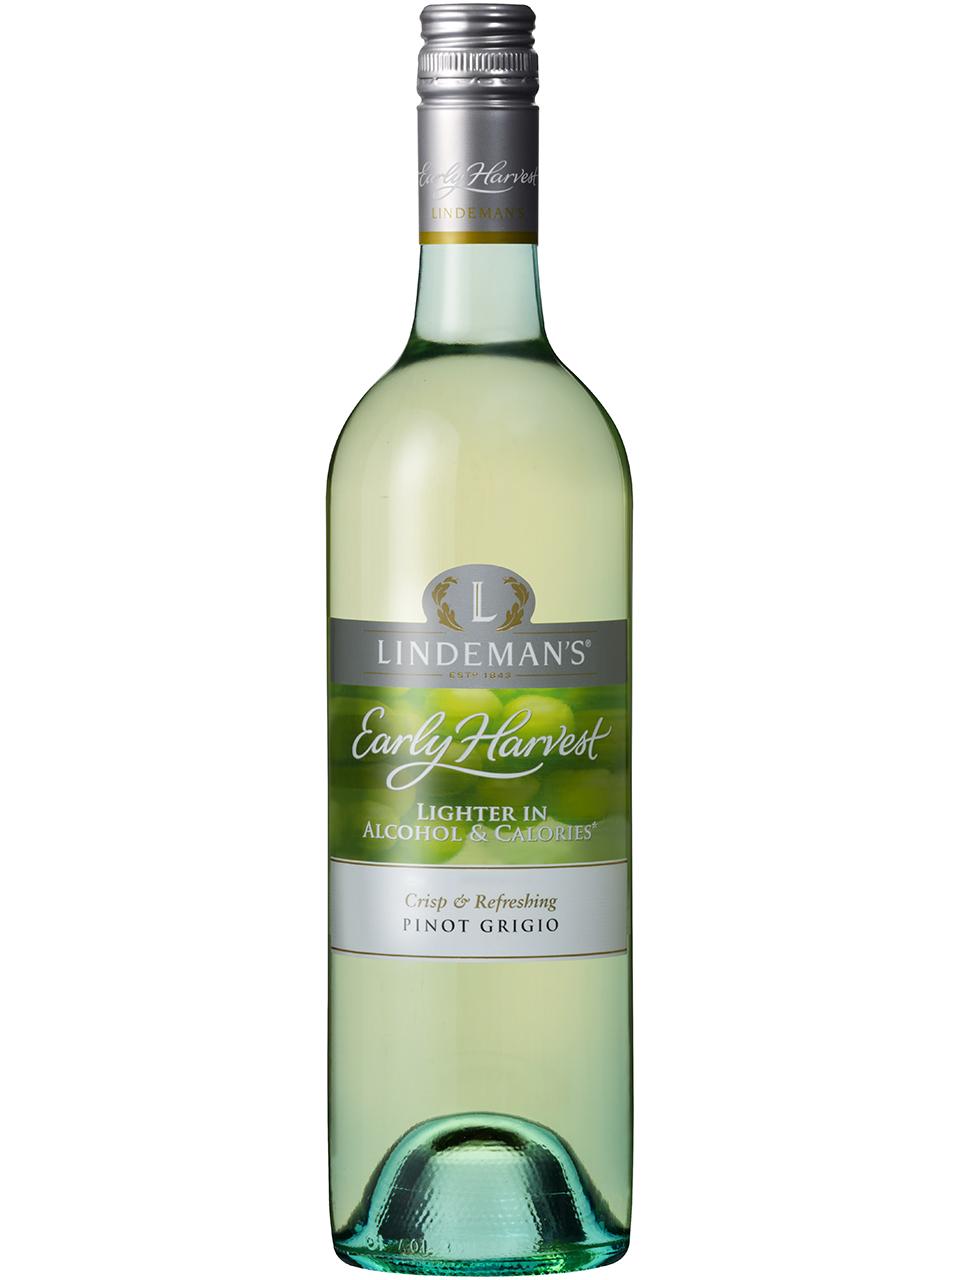 Lindeman's Early Harvest Pinot Grigio